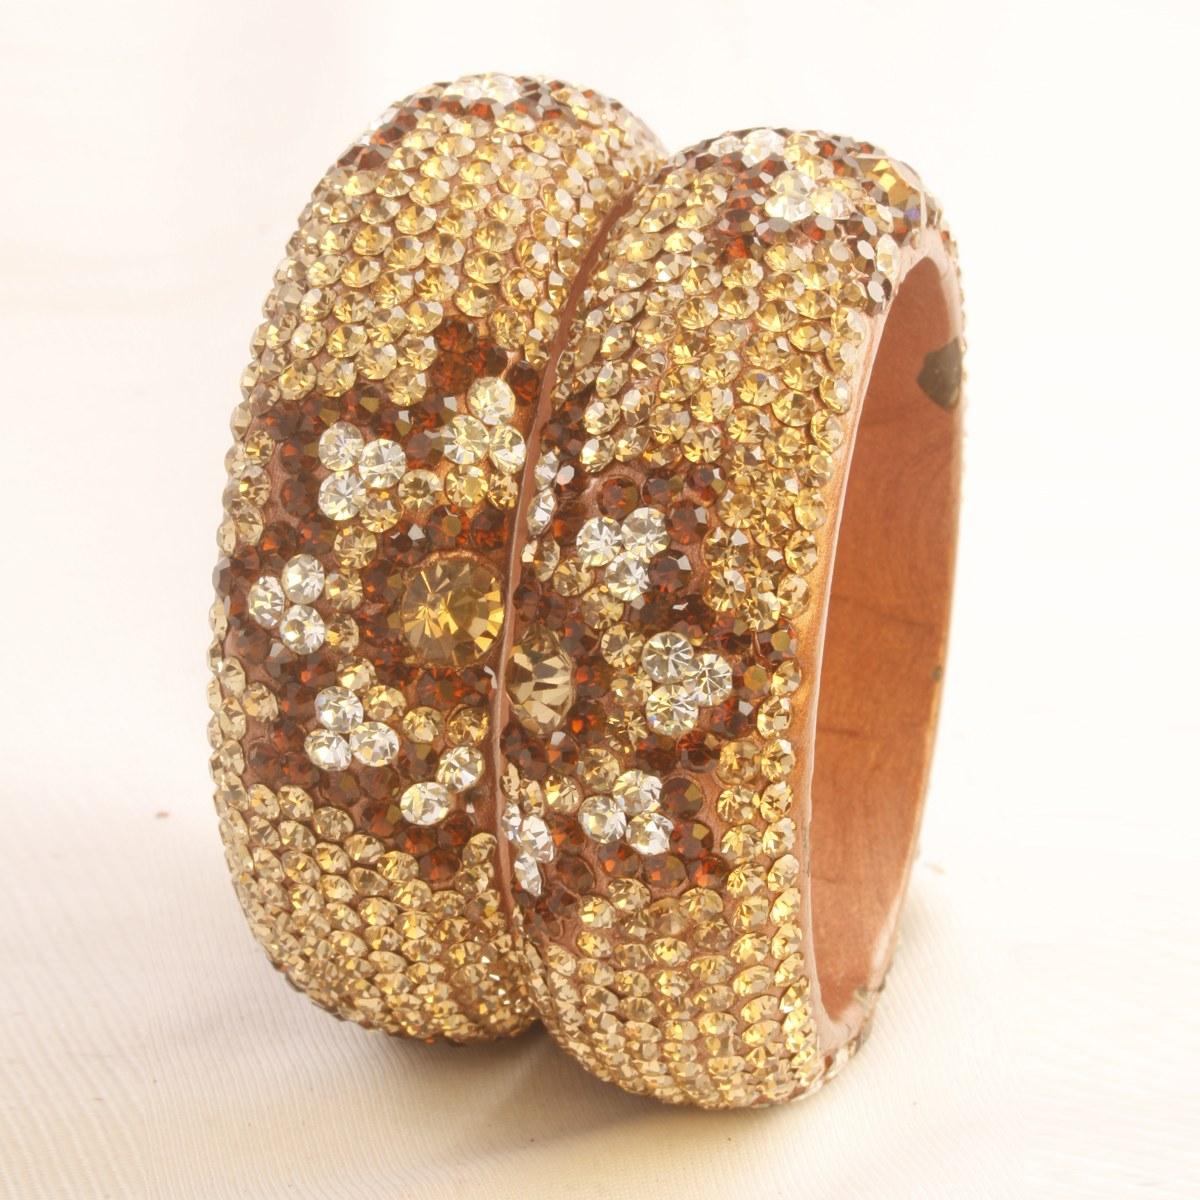 Gold Jewellery In Chandni Chowk, Central Delhi